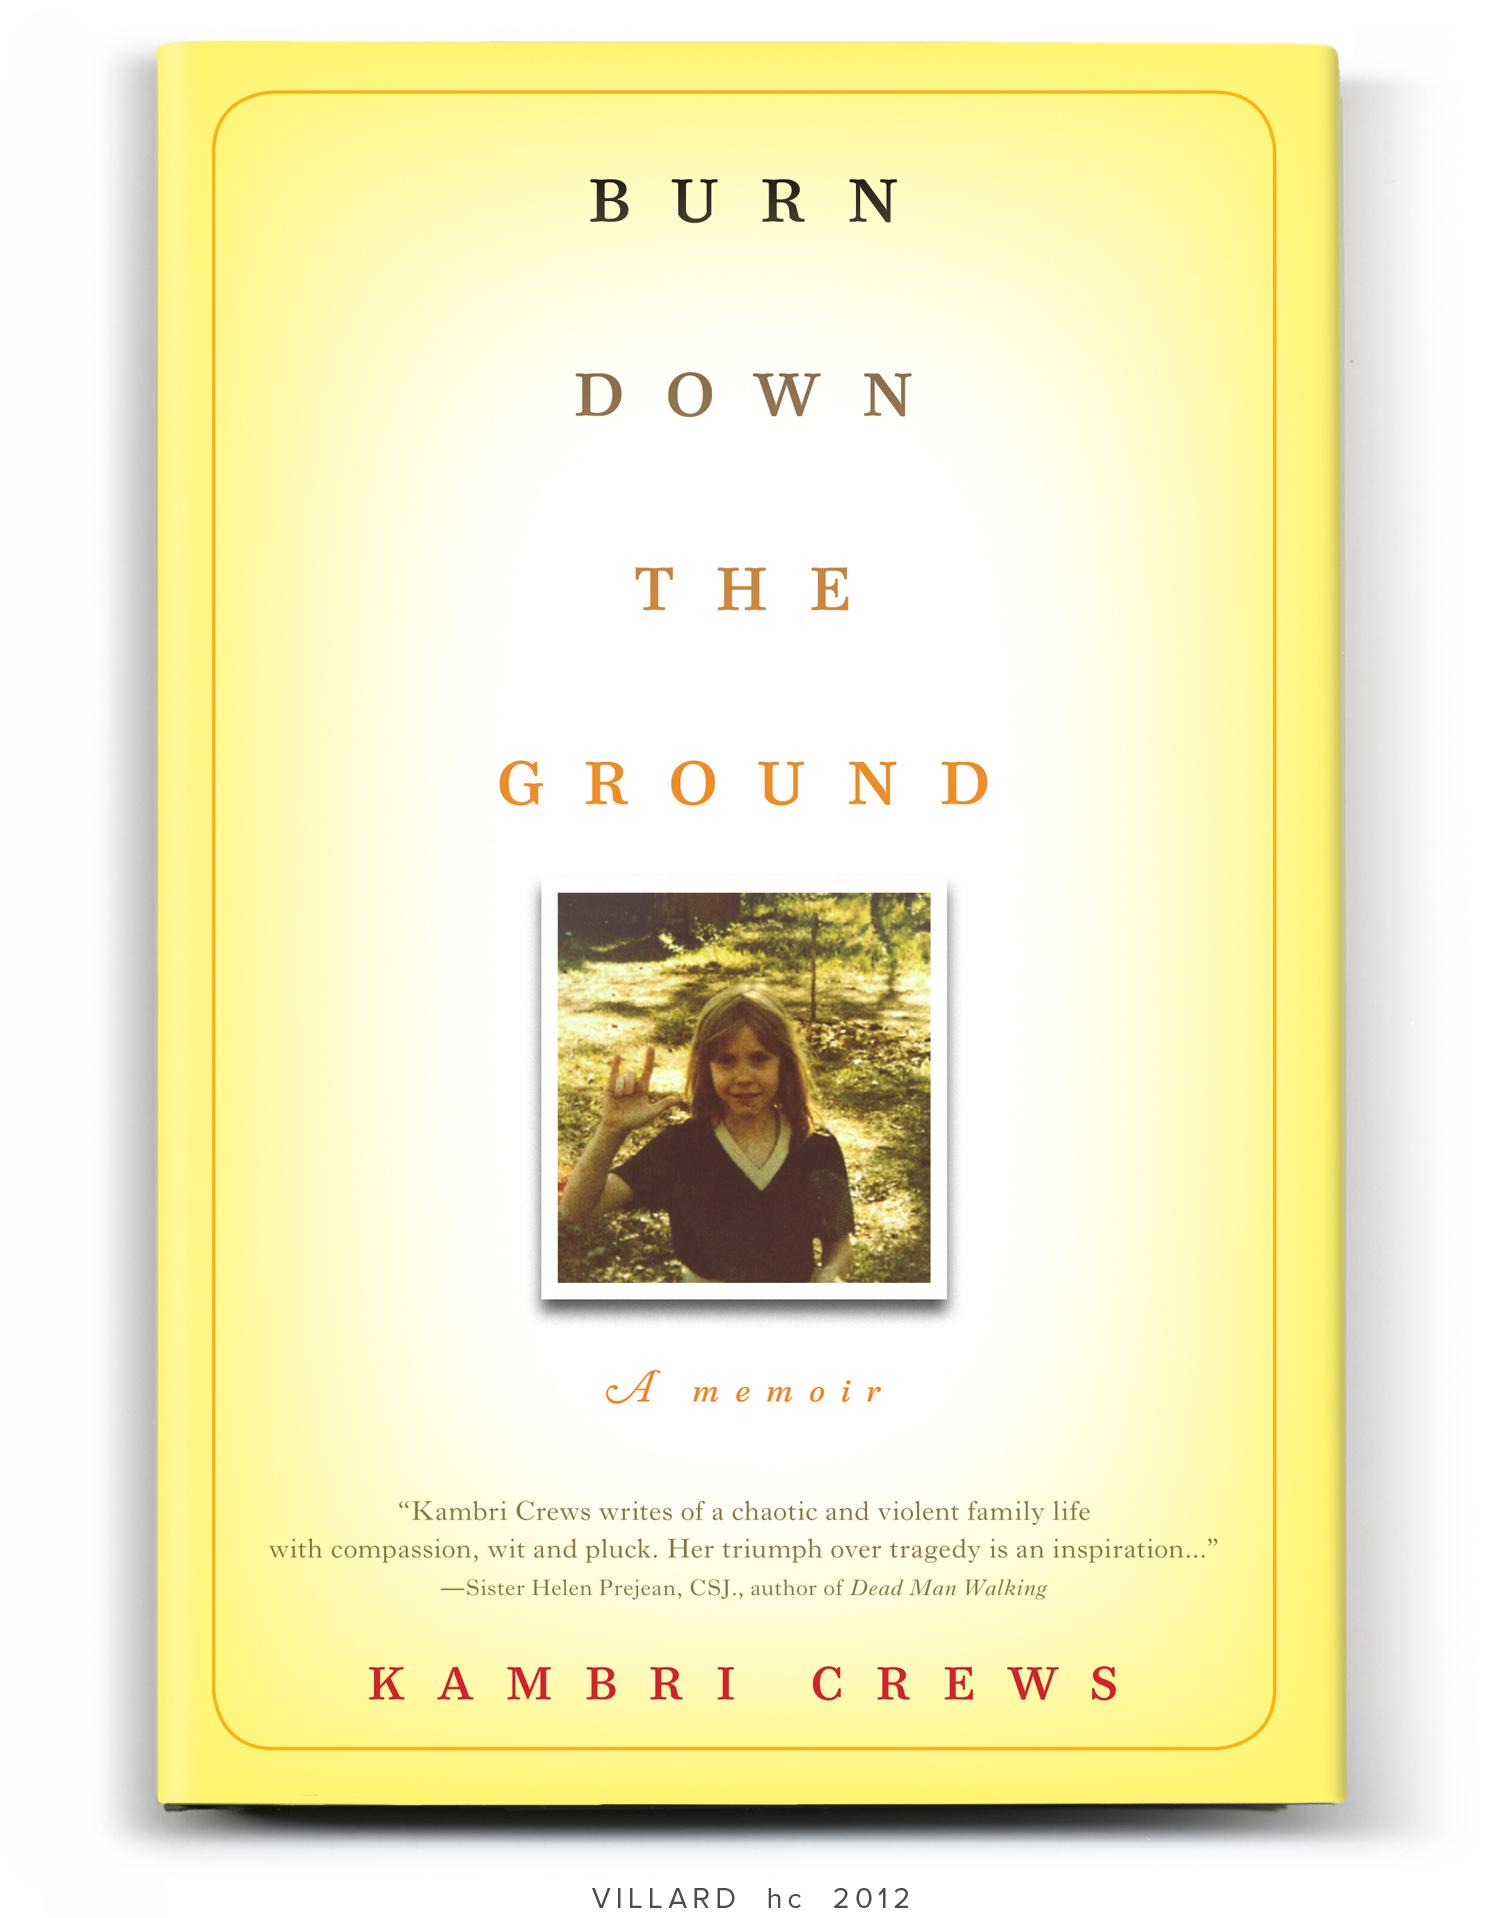 BURN-DOWN-THE-GROUND-hc-ss6.jpg